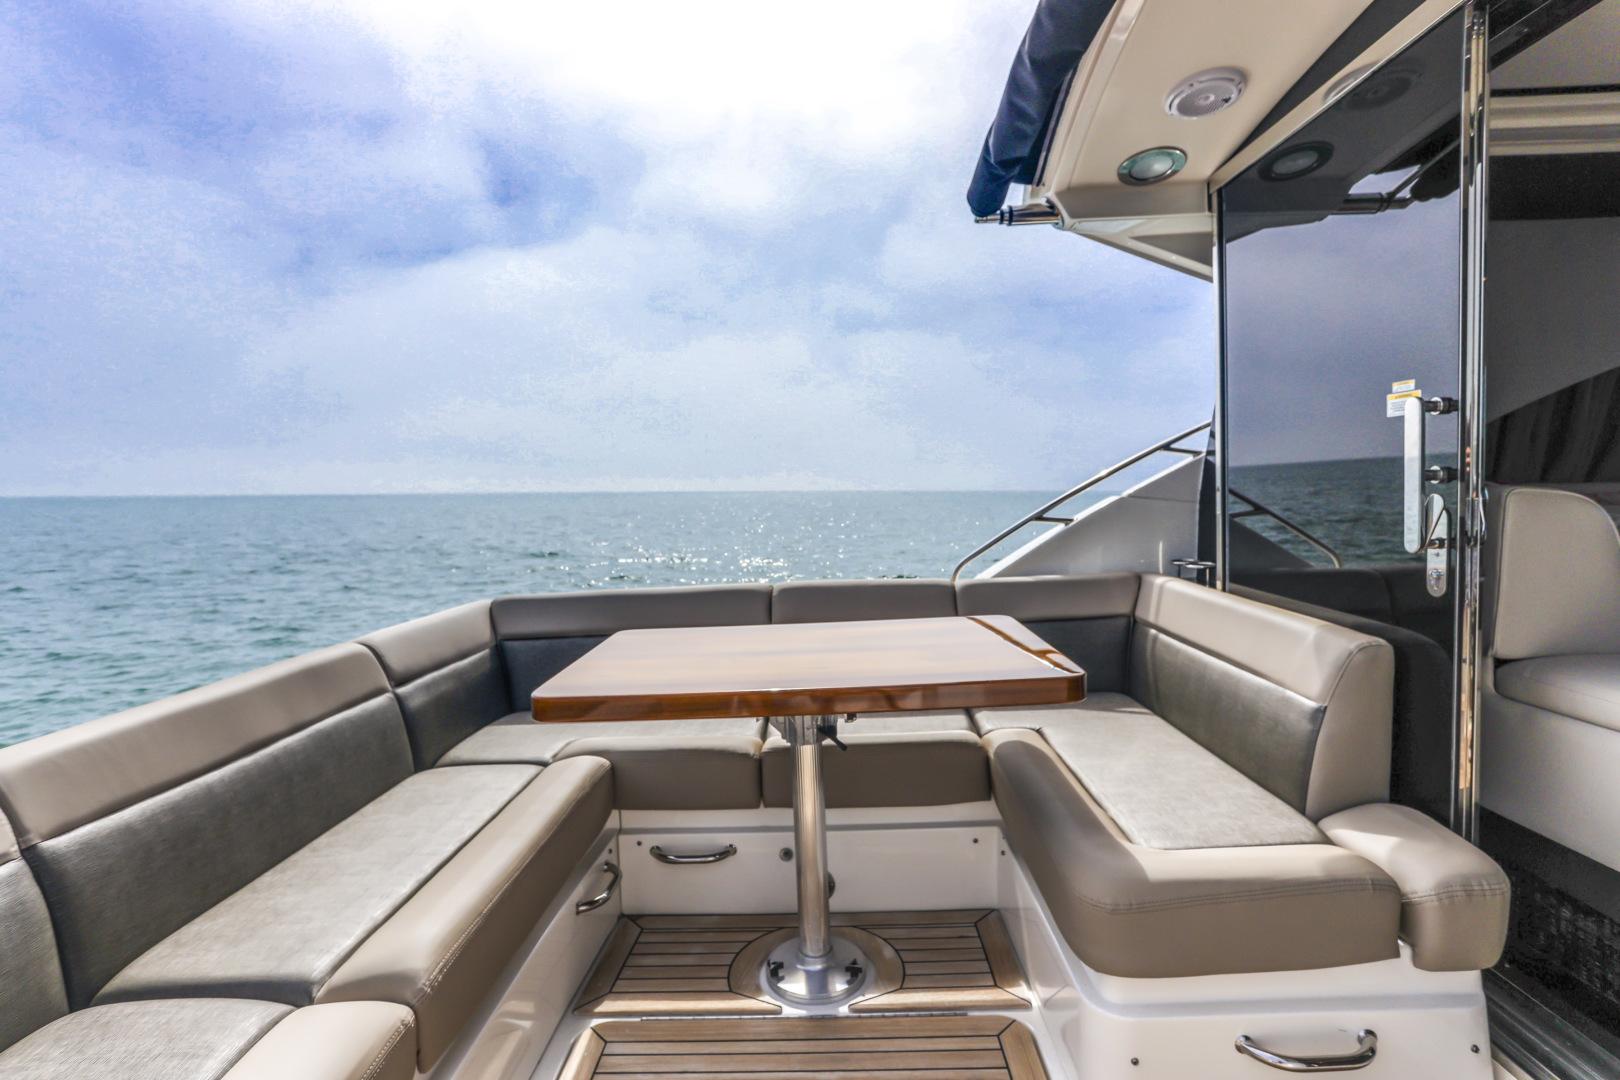 Sea Ray-510 Sundancer 2016 -Staten Island -New York-United States-Cockpit -1458301   Thumbnail